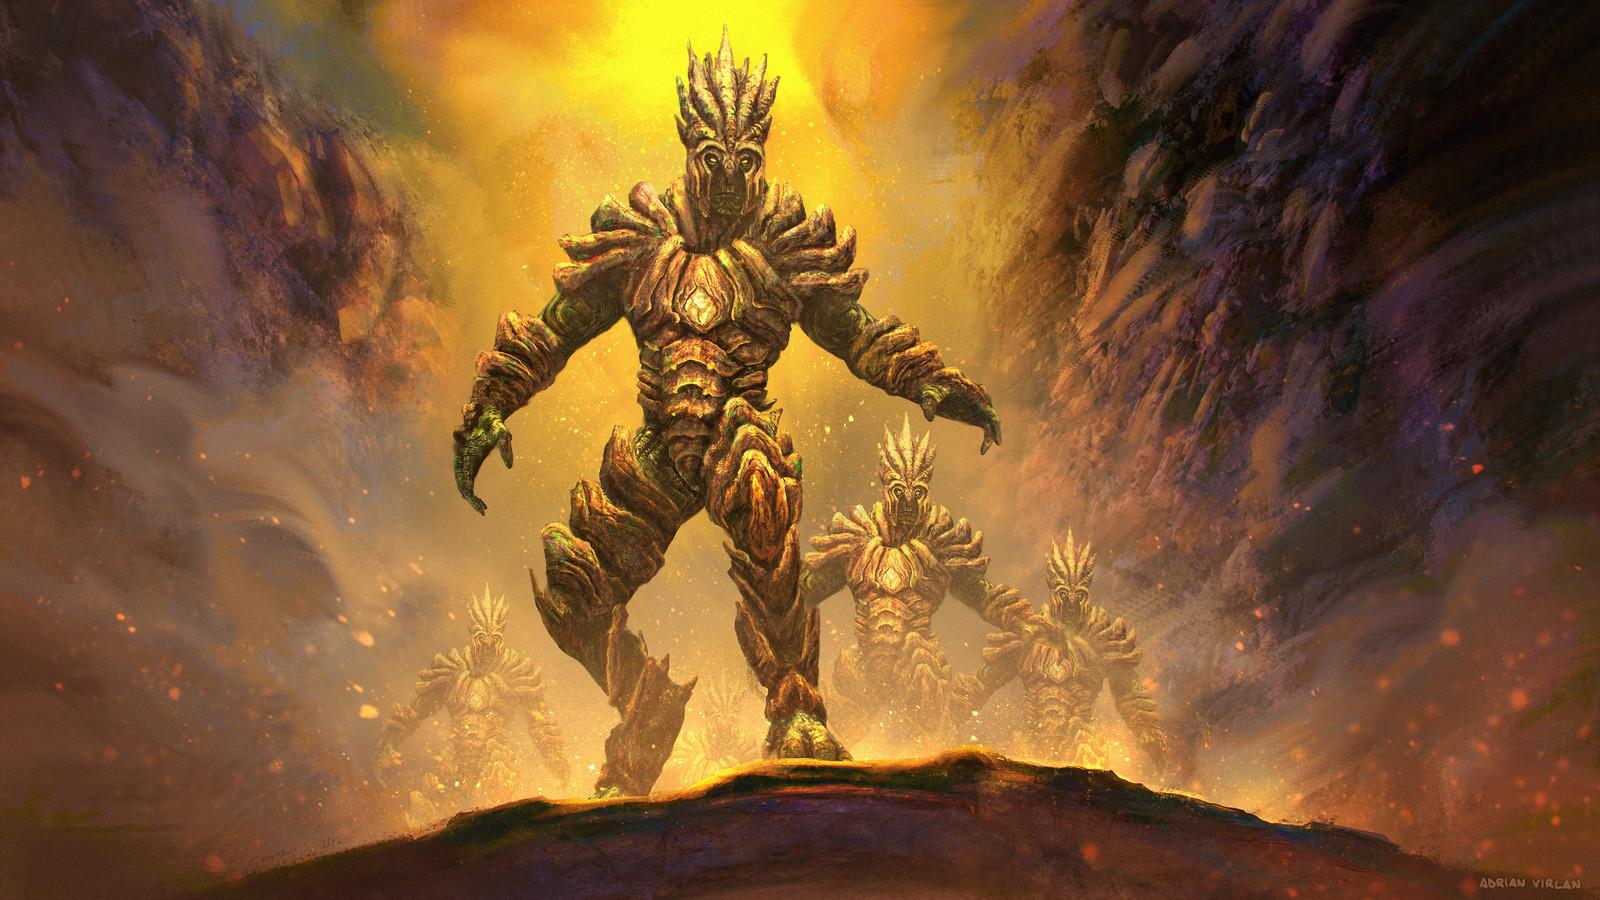 Urien armor character